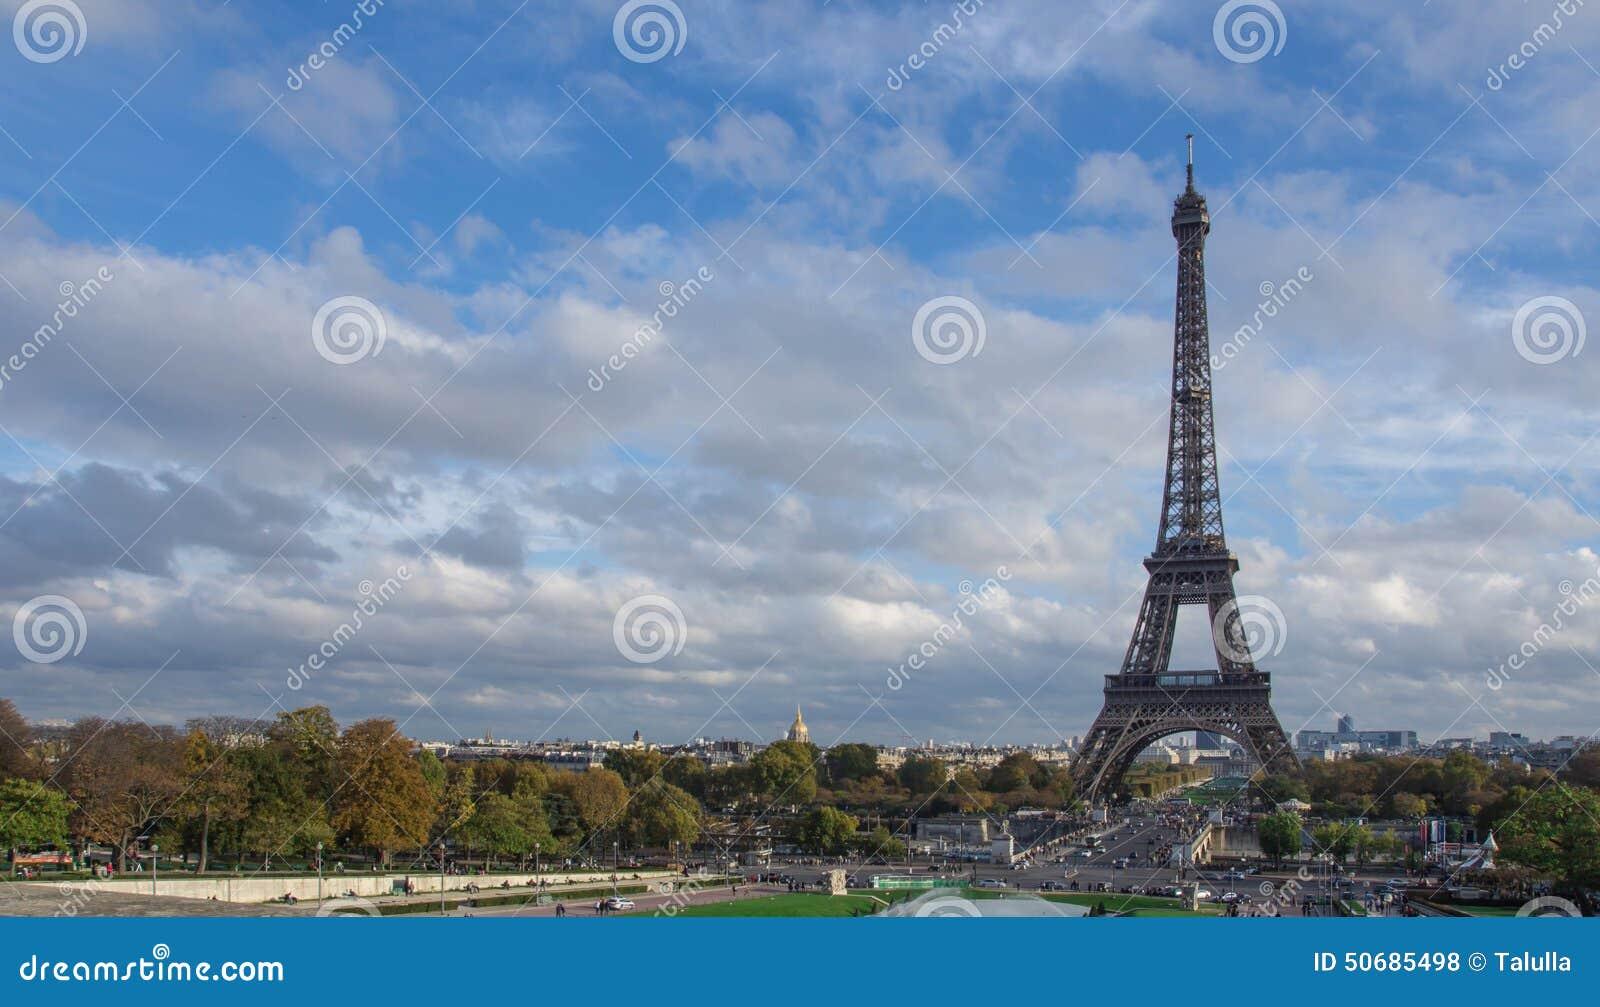 Download 埃菲尔・法国巴黎塔视图 库存照片. 图片 包括有 阳光, 全景, 知道, 蓝色, 游人, 旅游业, 城市 - 50685498